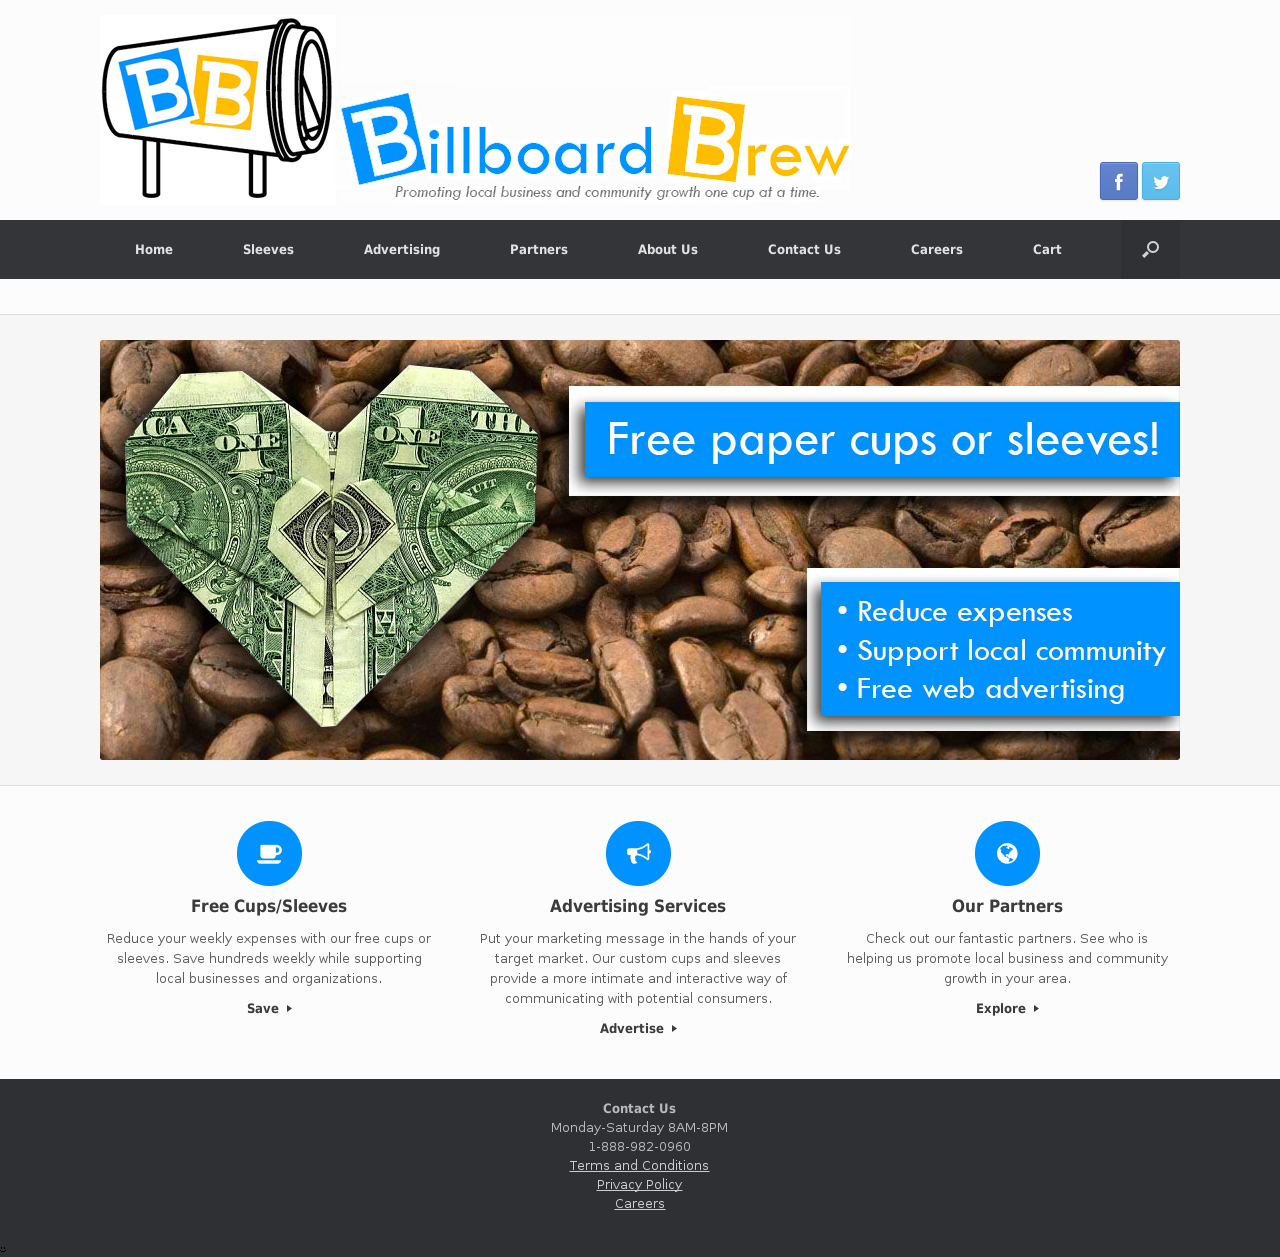 billboardbrew.com-20150114-156849334495eb9ec29b649ef4907939